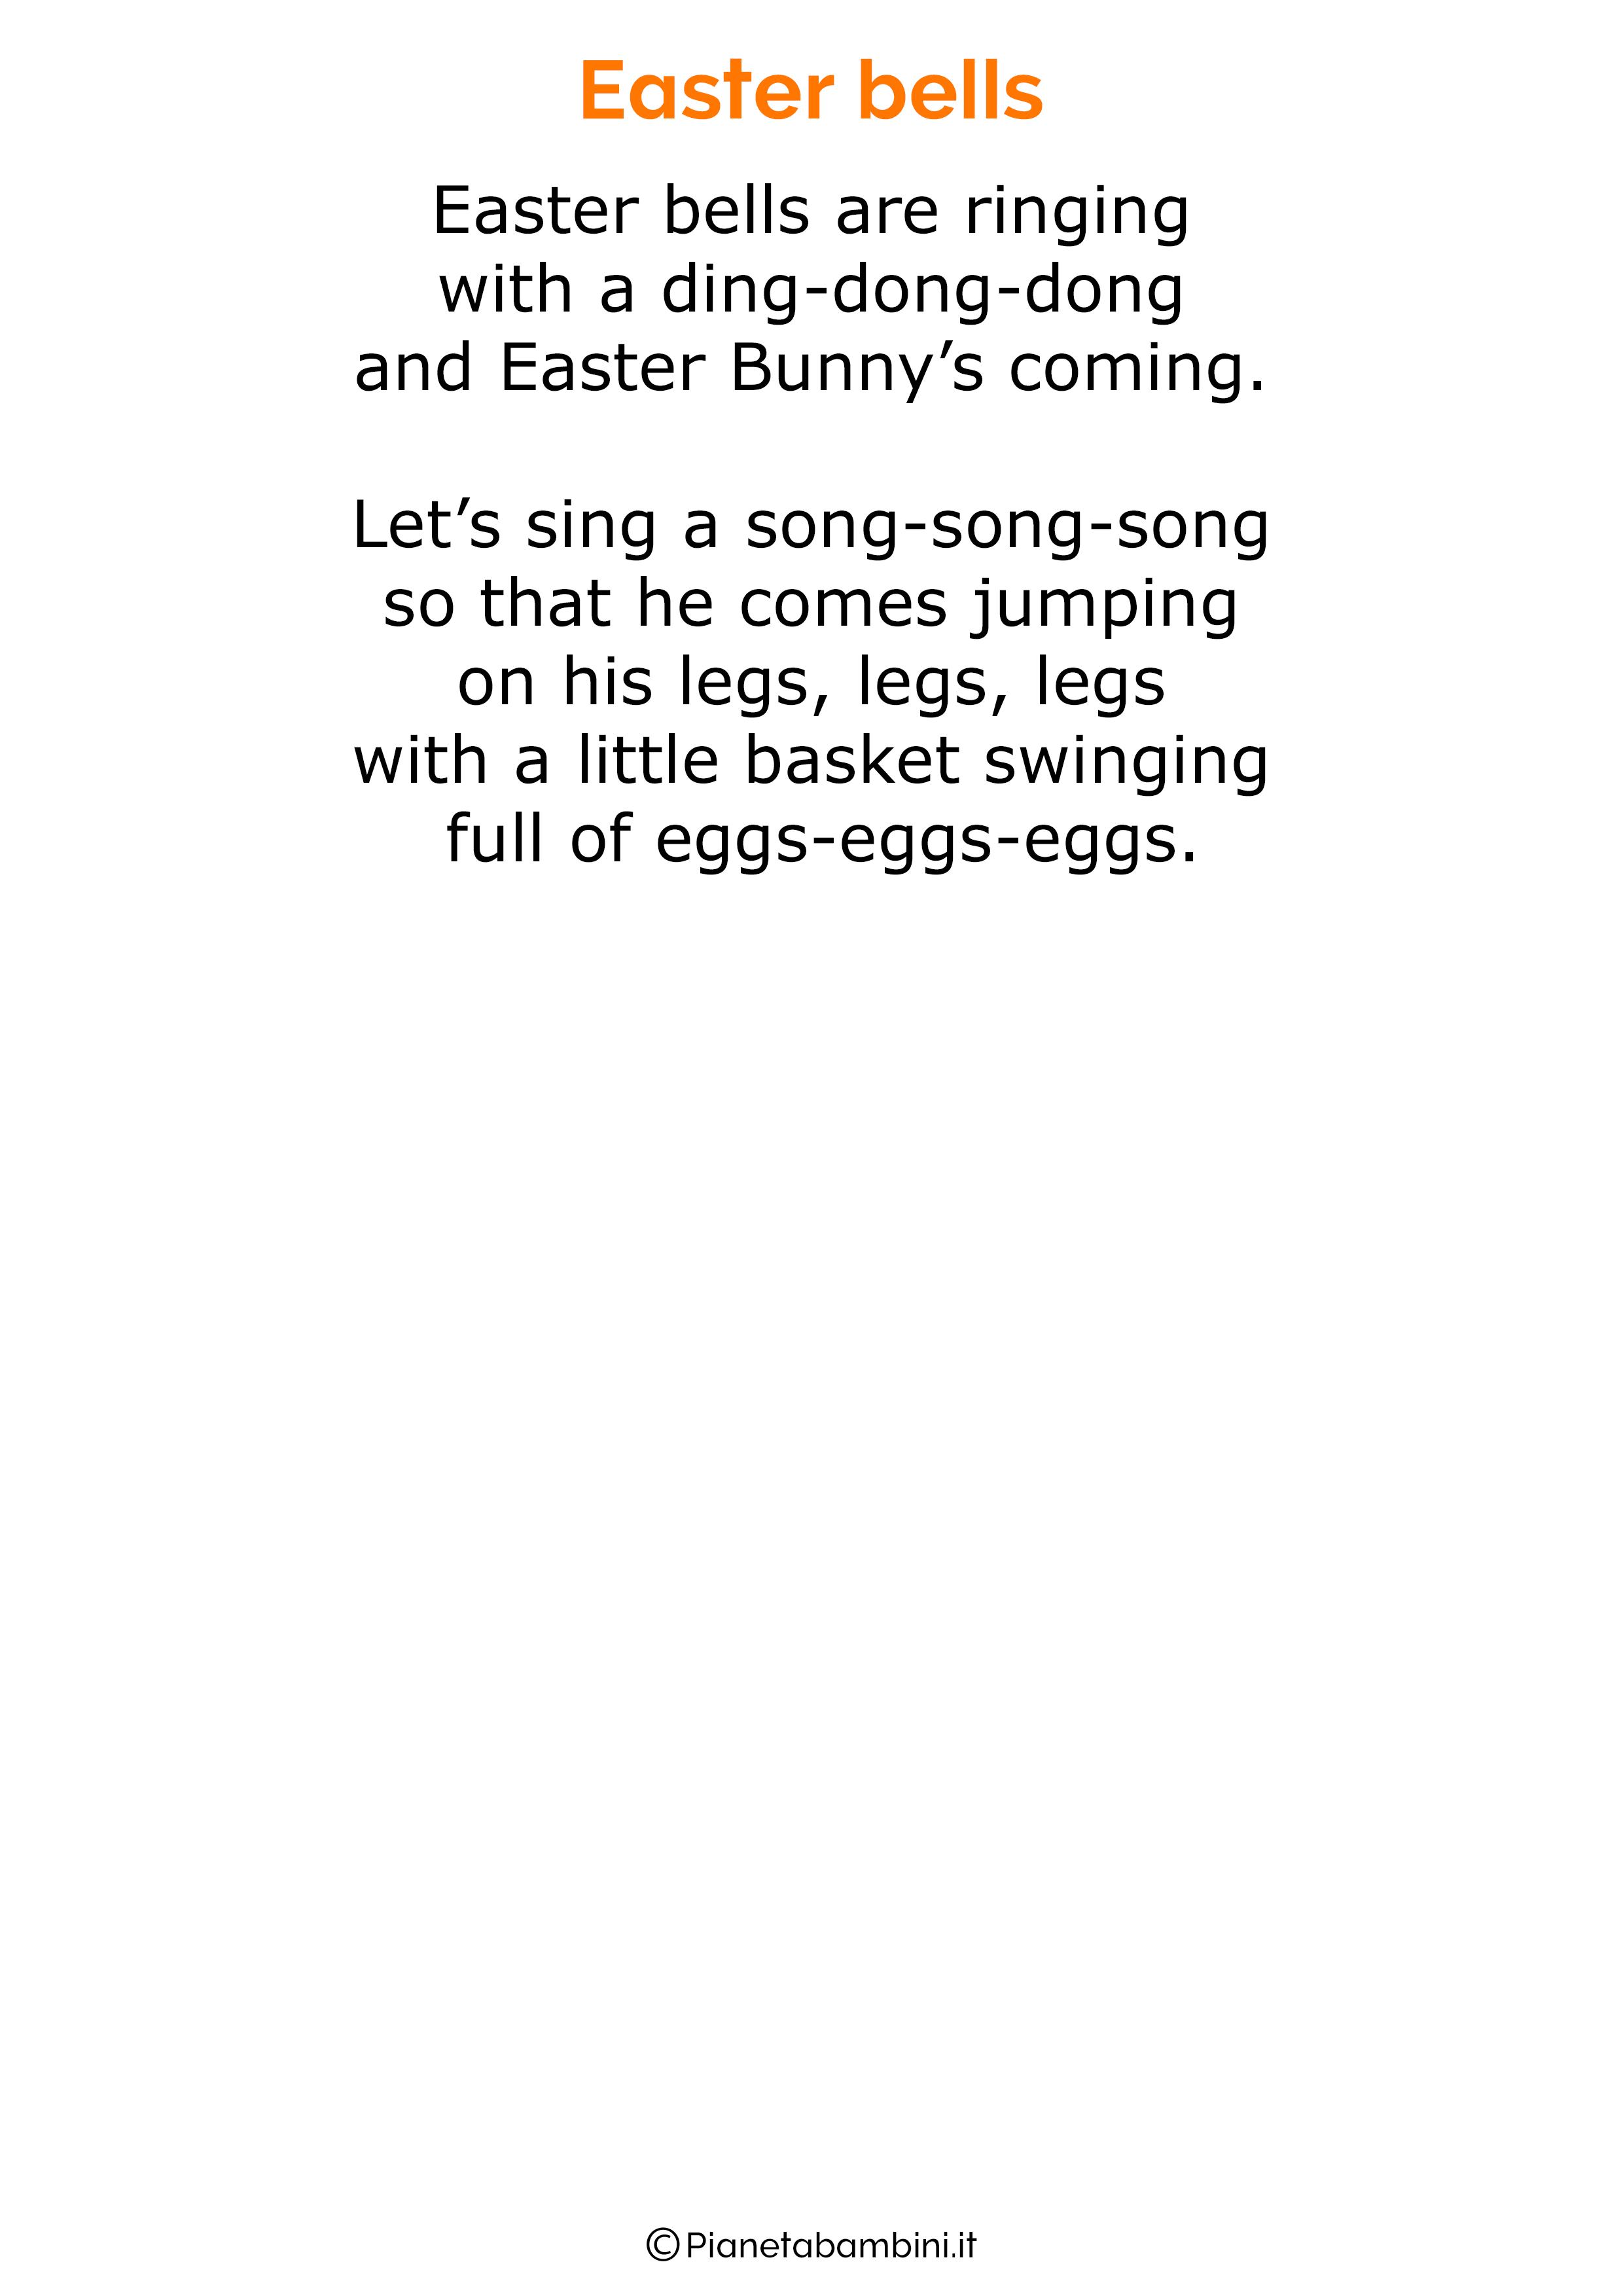 Poesie di Pasqua in inglese per bambini 03